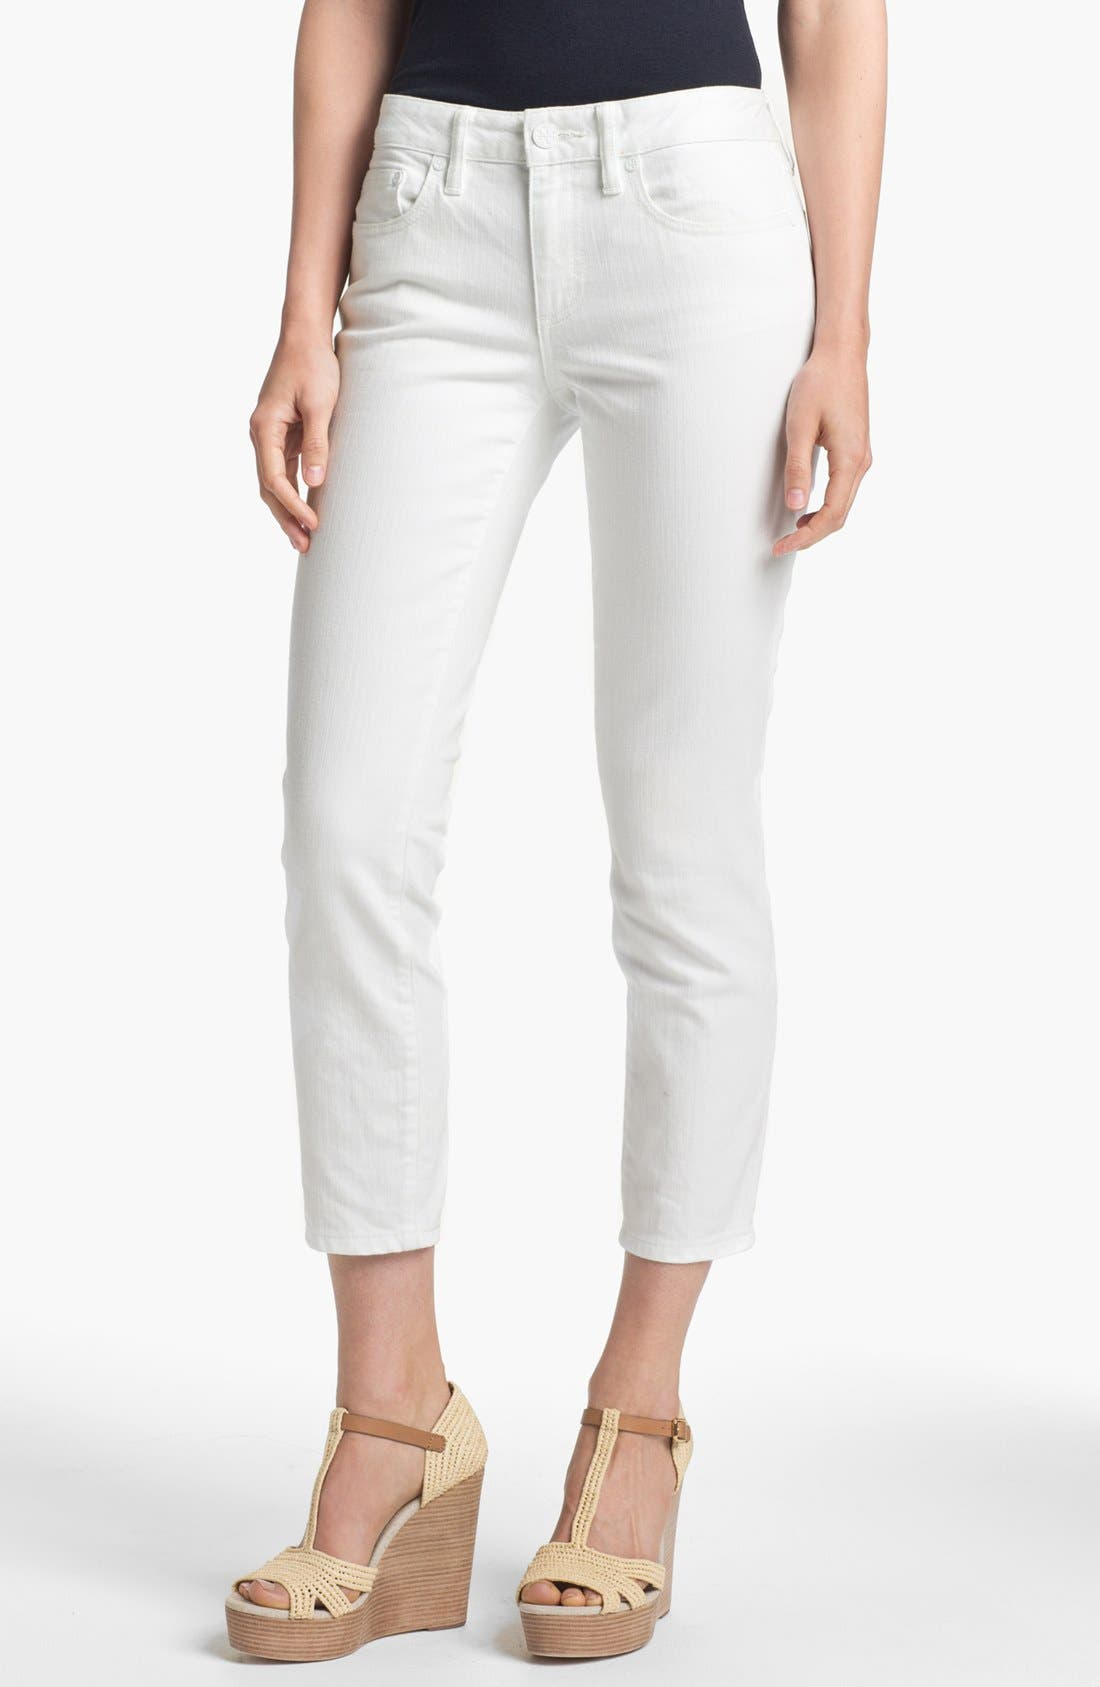 Main Image - Tory Burch 'Alexa' Crop Skinny Stretch Jeans